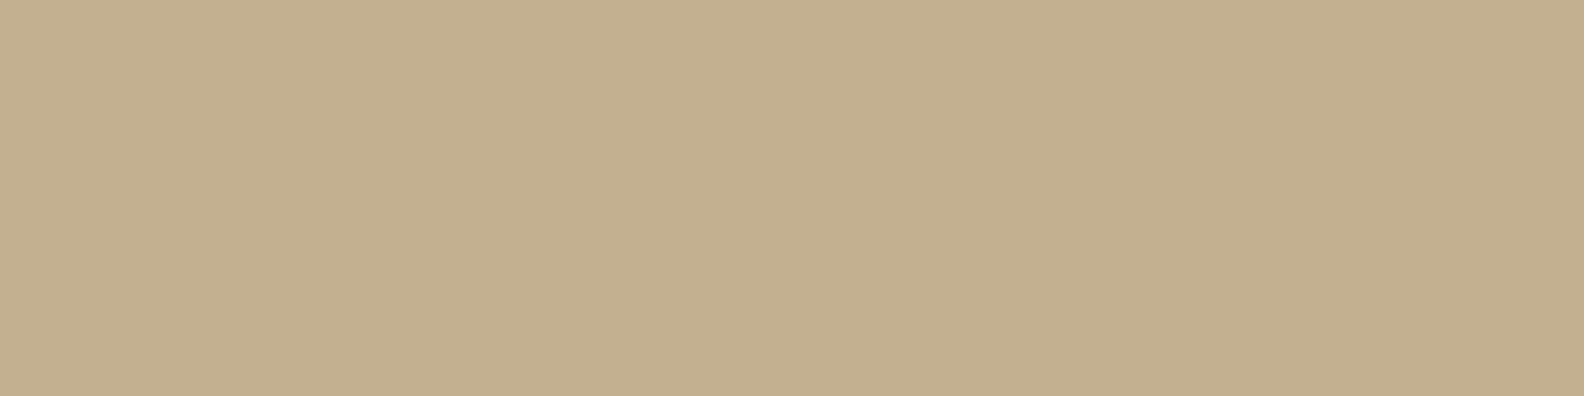 1584x396 Khaki Web Solid Color Background